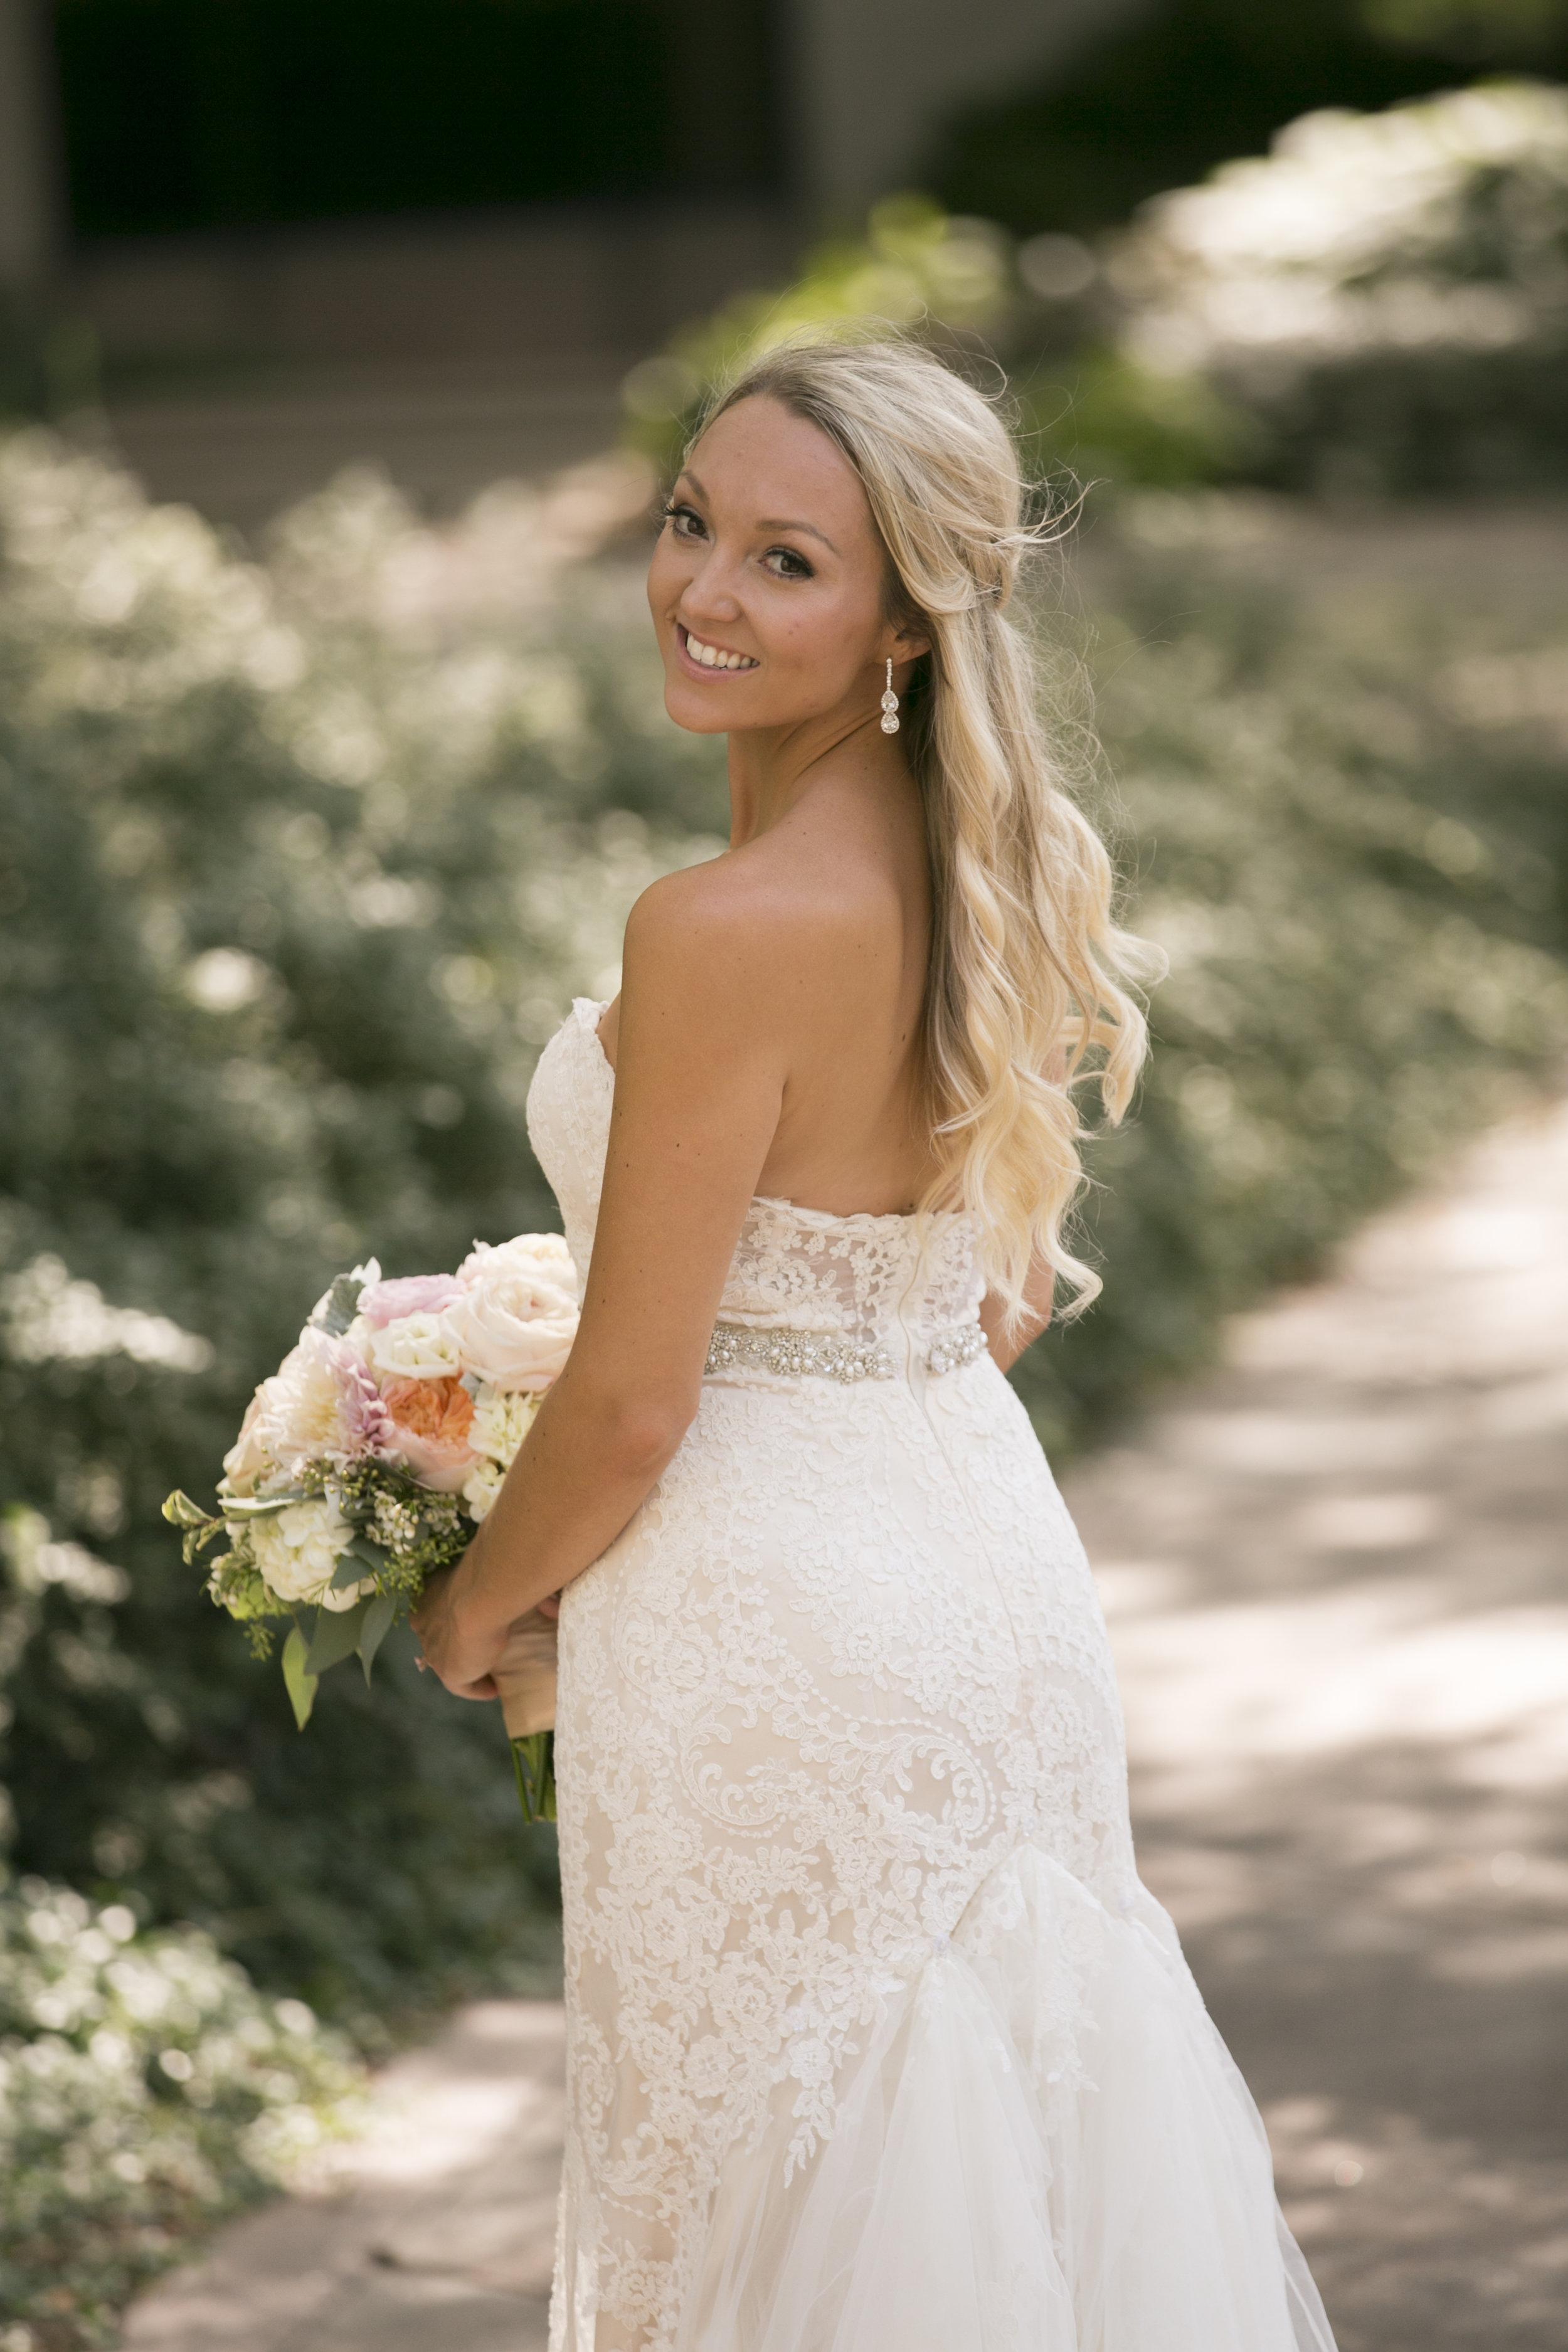 Bride_145.jpg